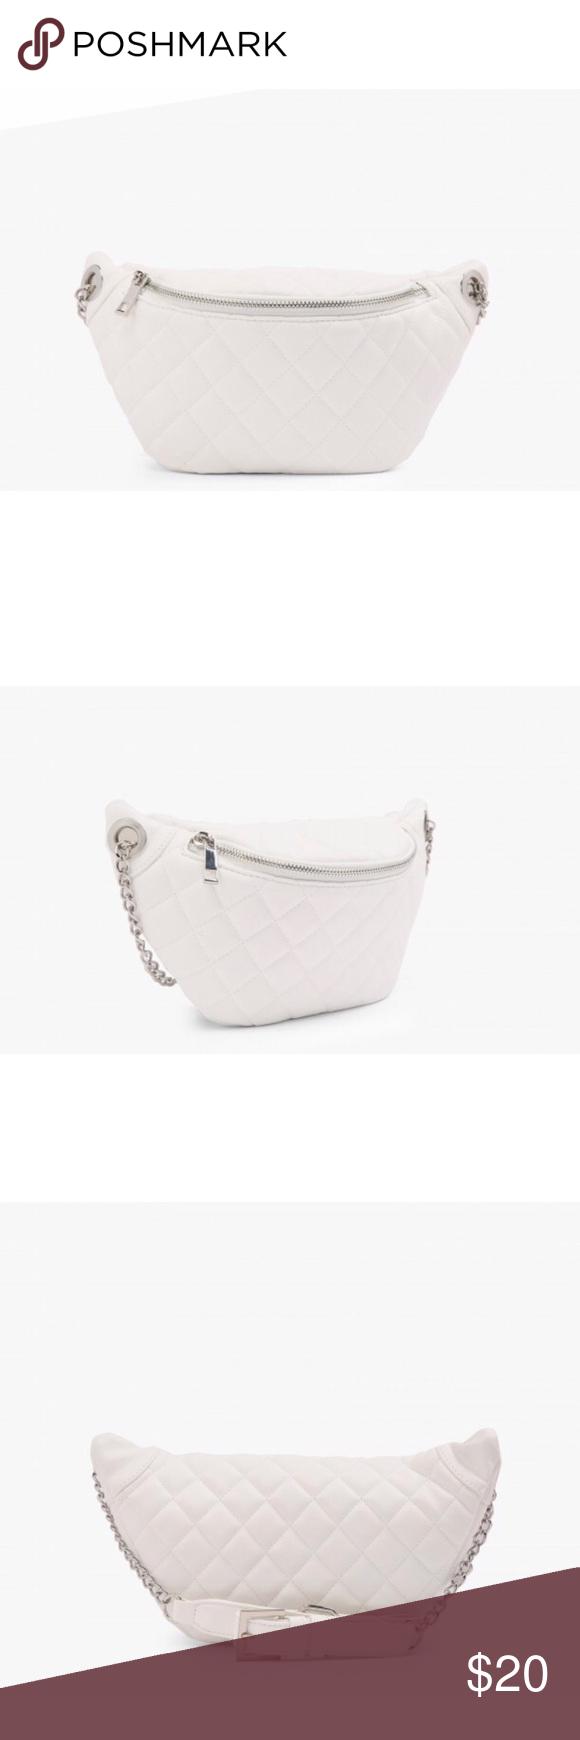 Forever 21 White Quilted Belt Bag Belt bag, White faux